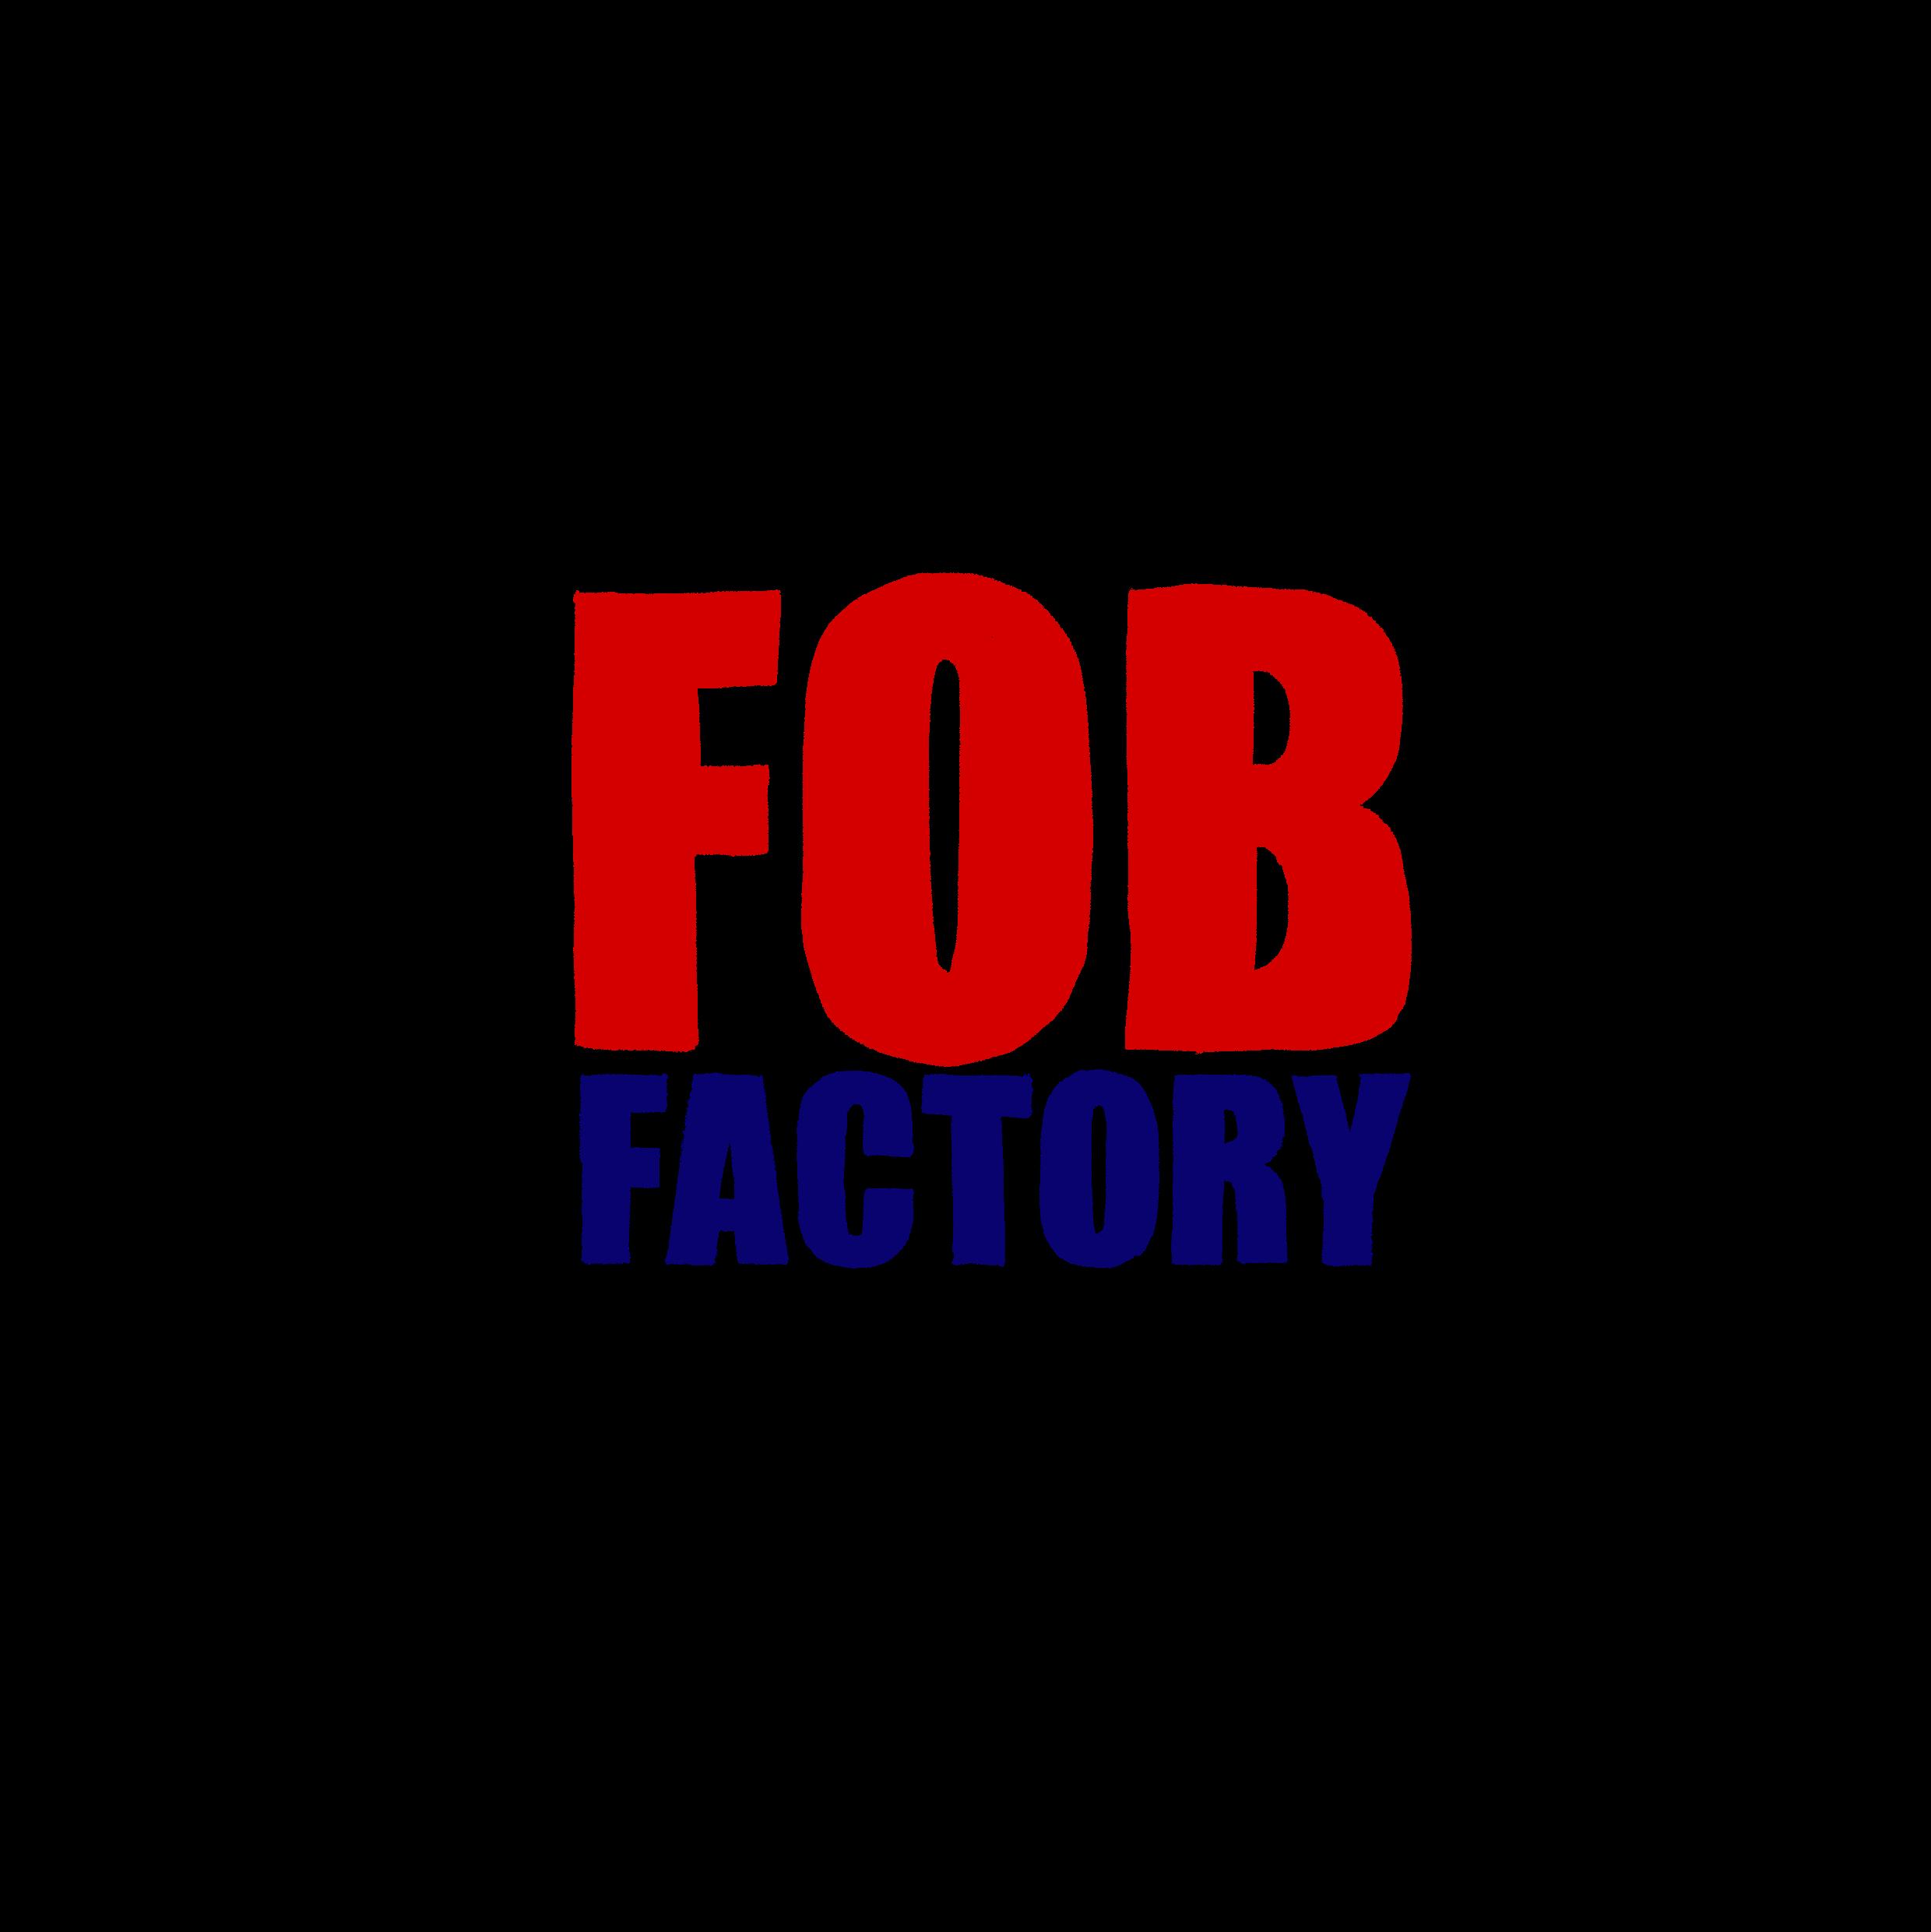 F.O.B Factory logo